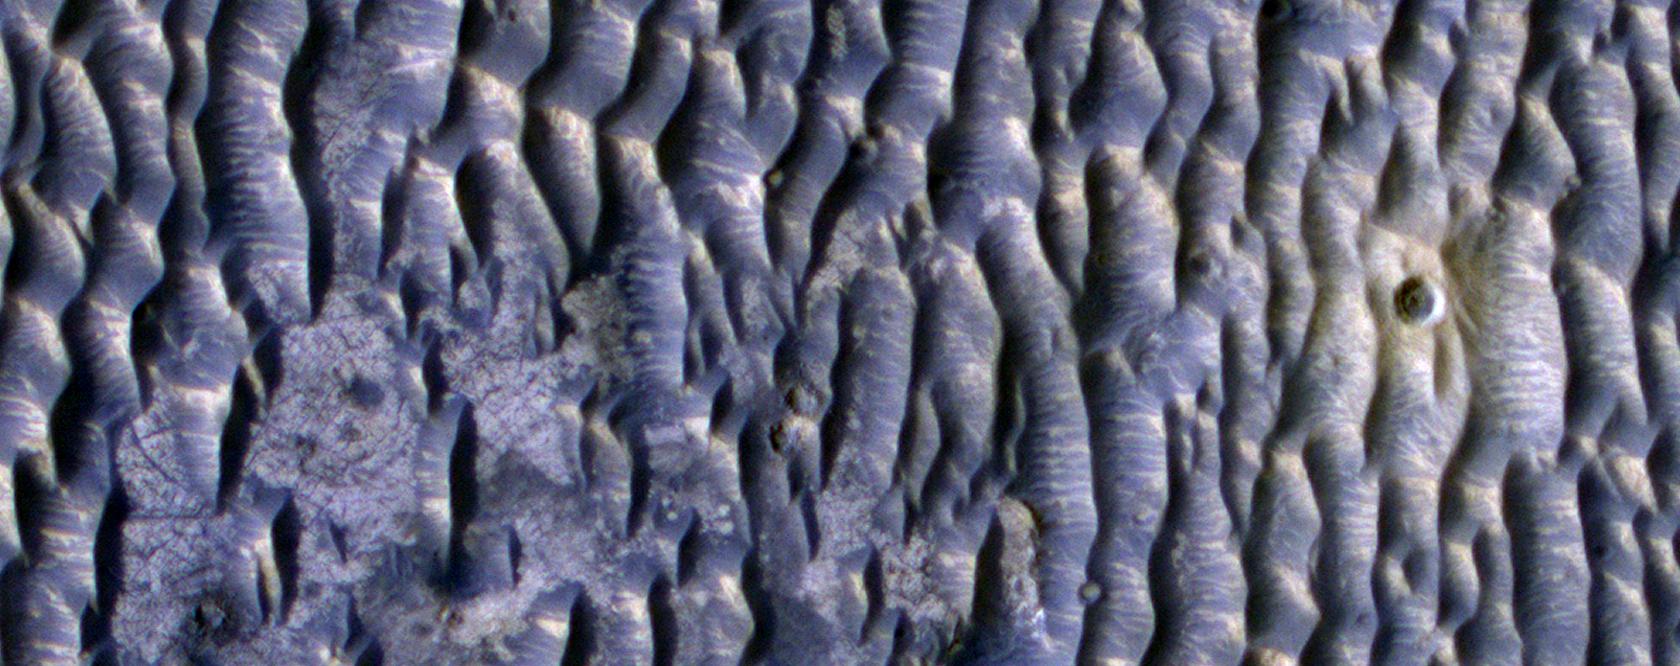 Southeast Edge of Hematite-Rich Terrain